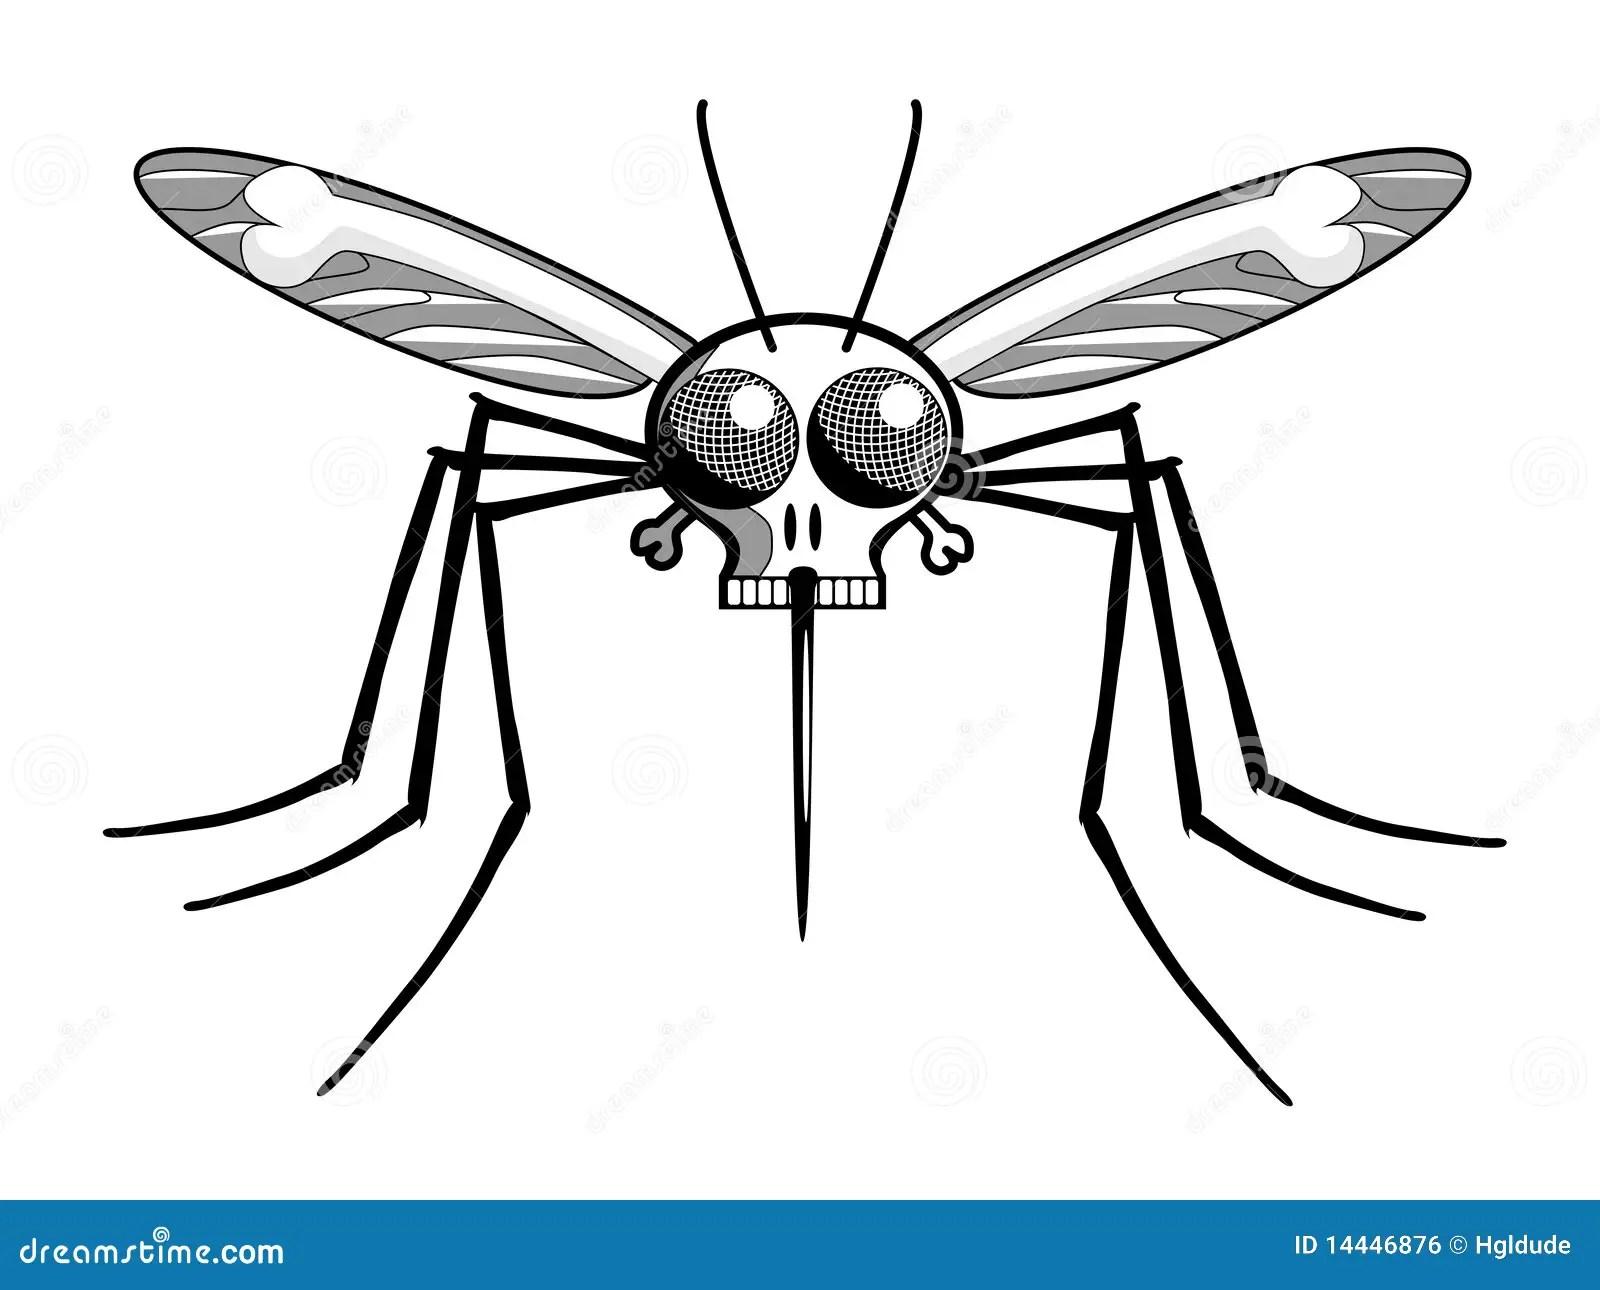 S Head Malaria Mosquito Royalty Free Stock Image